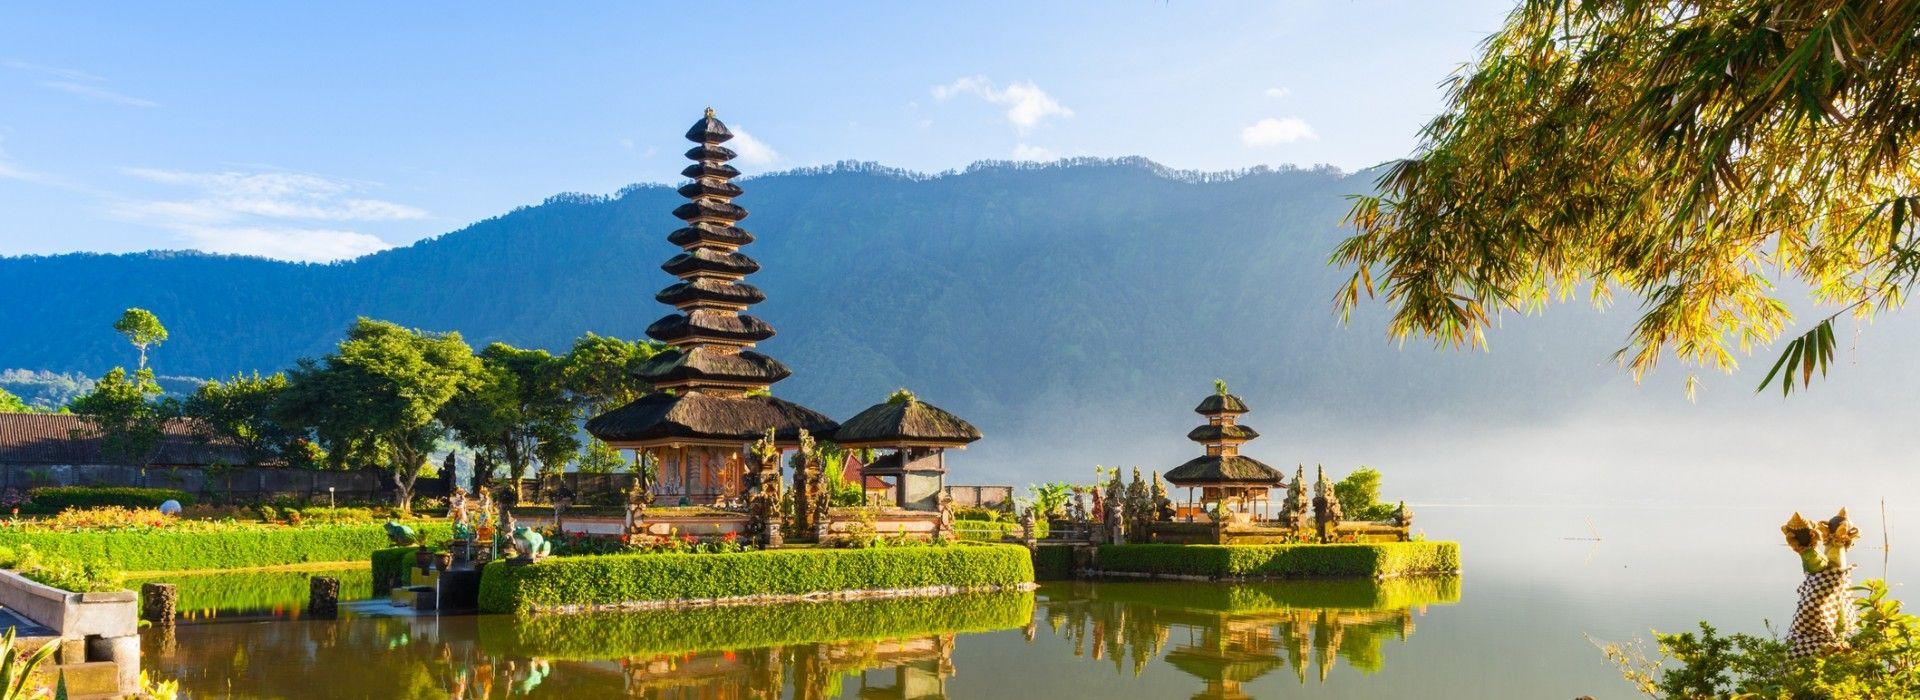 Spas Tours in Bali